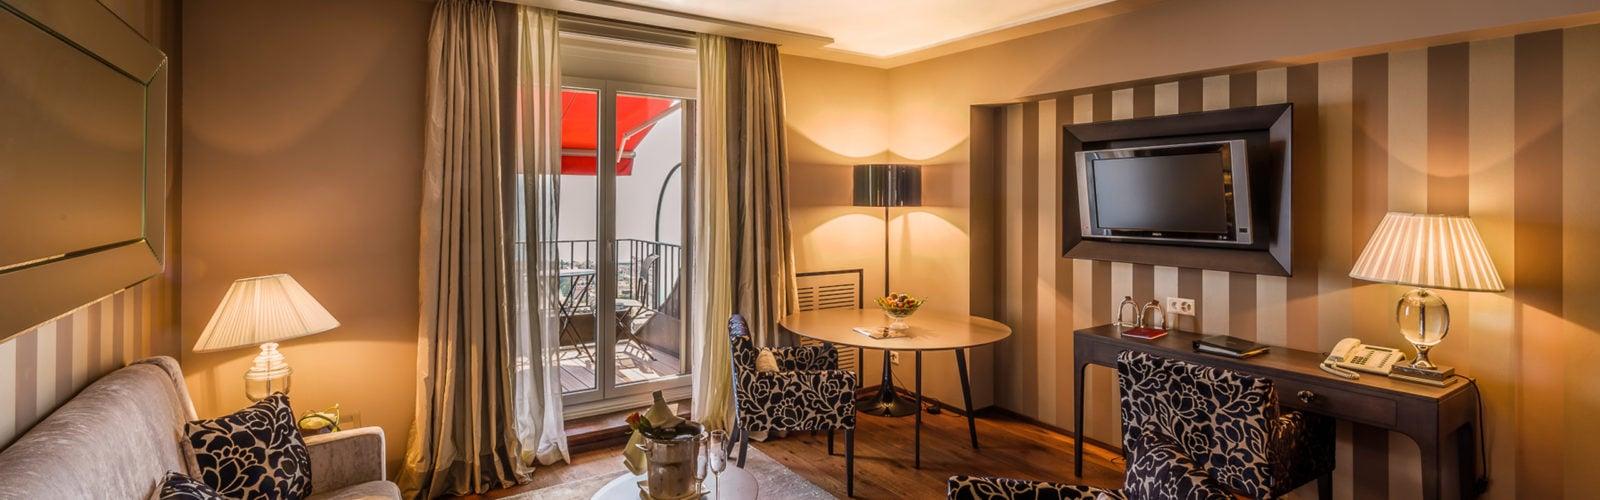 lausanne-palace-suite-living-room